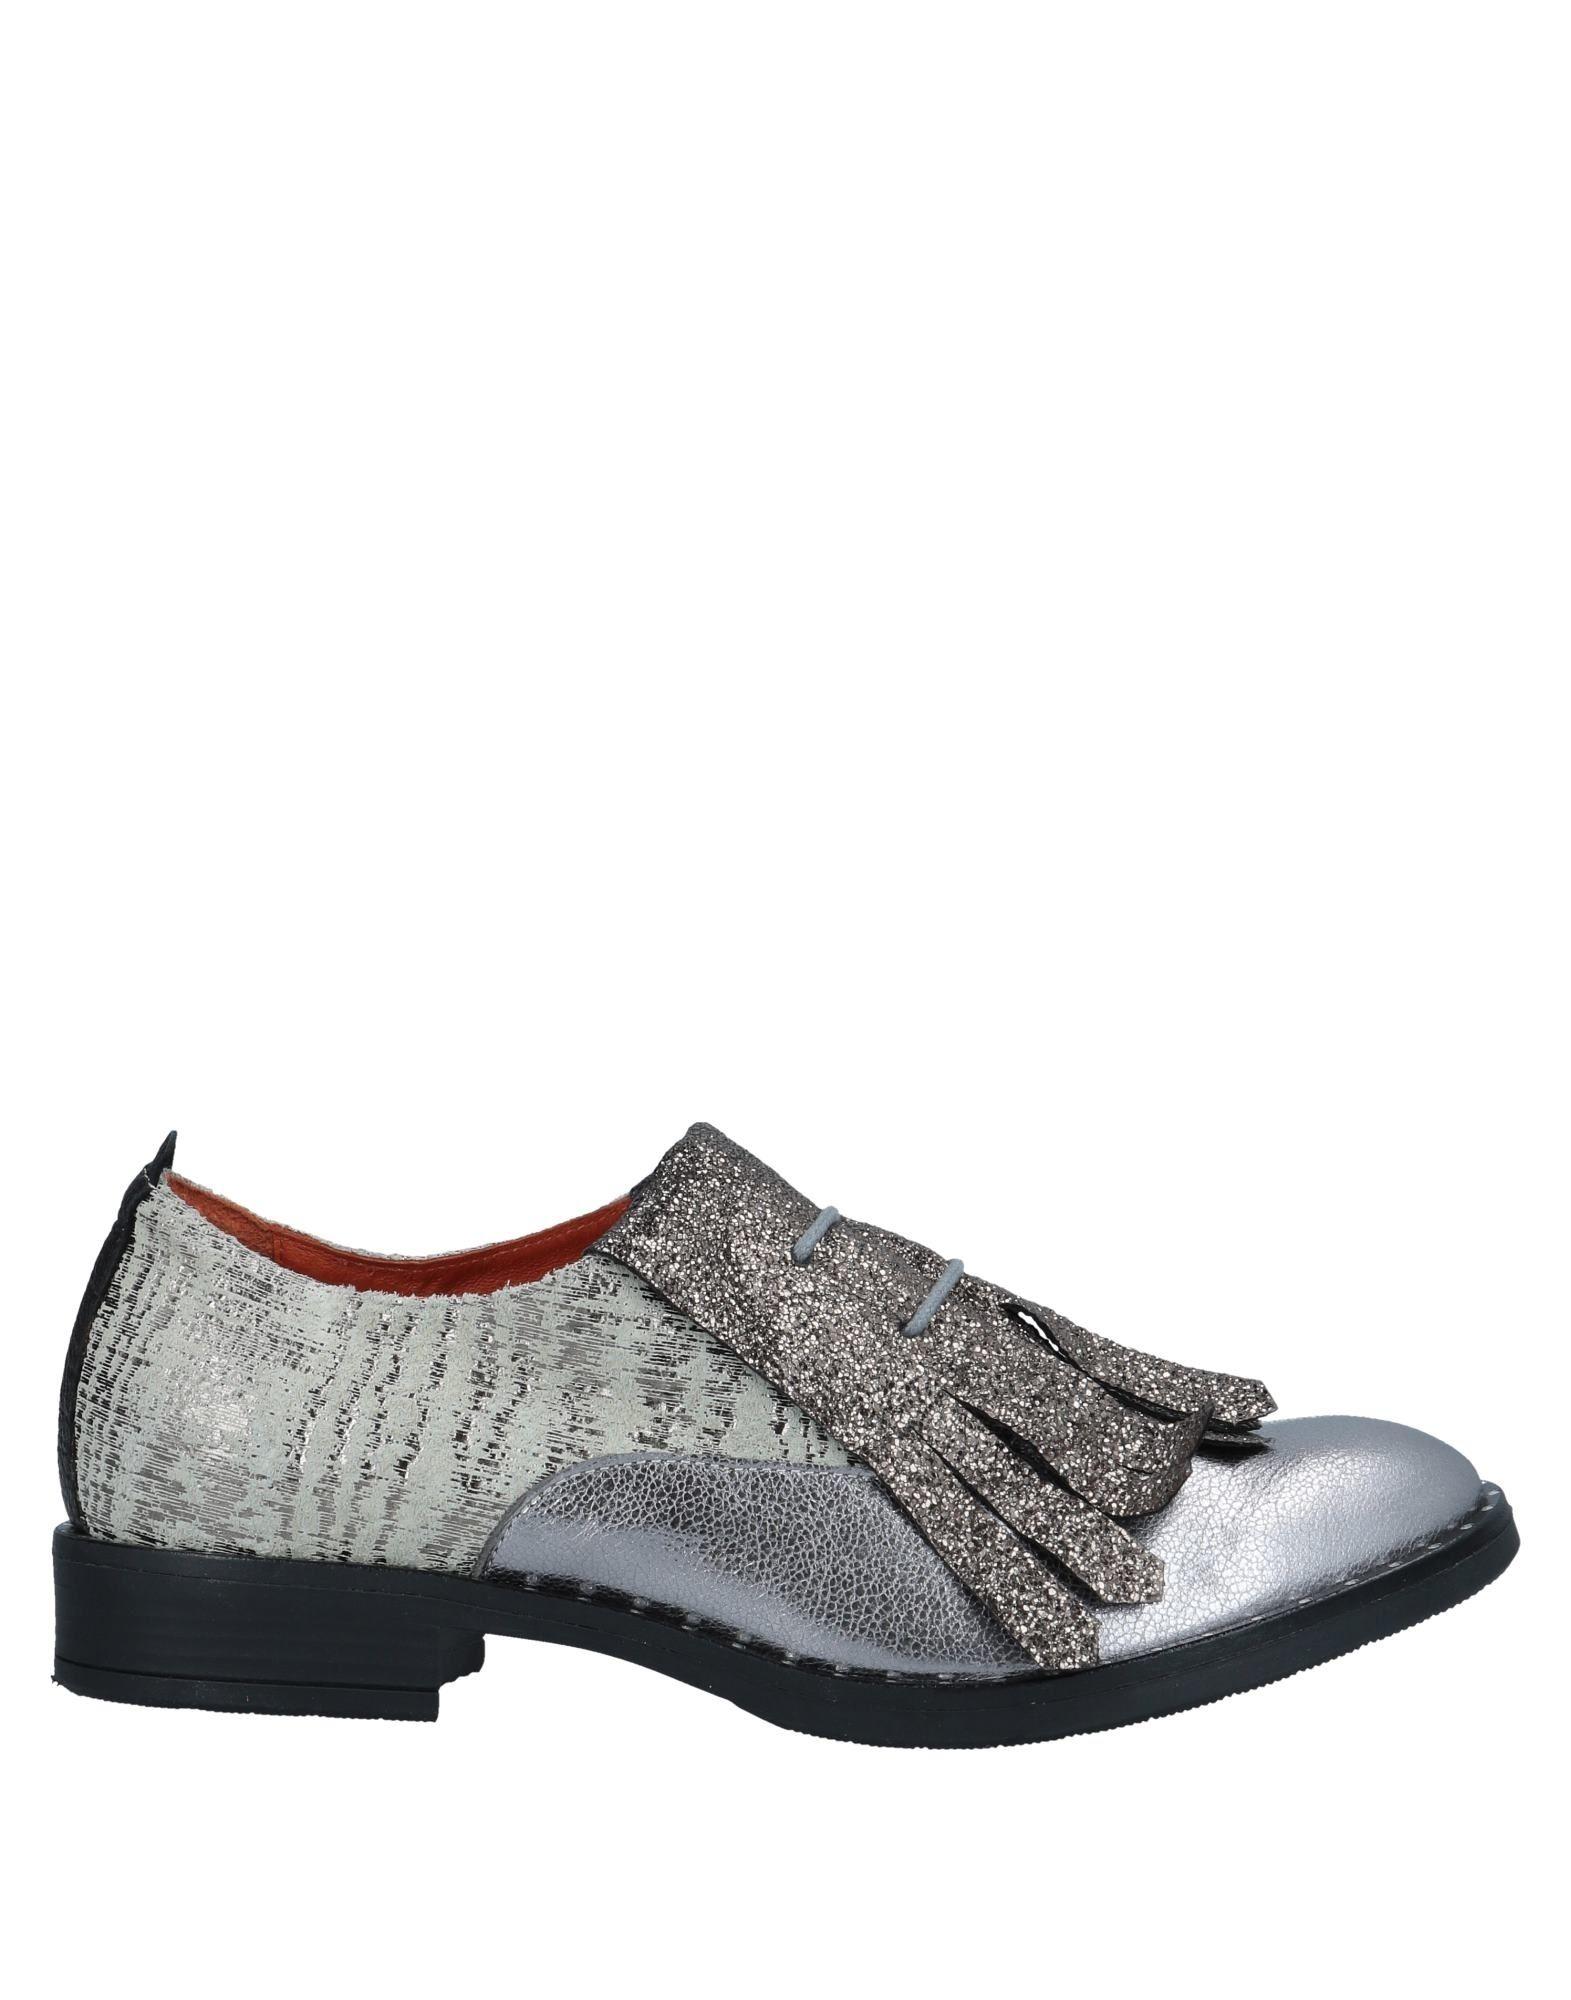 Фото - EBARRITO Обувь на шнурках обувь на высокой платформе dkny